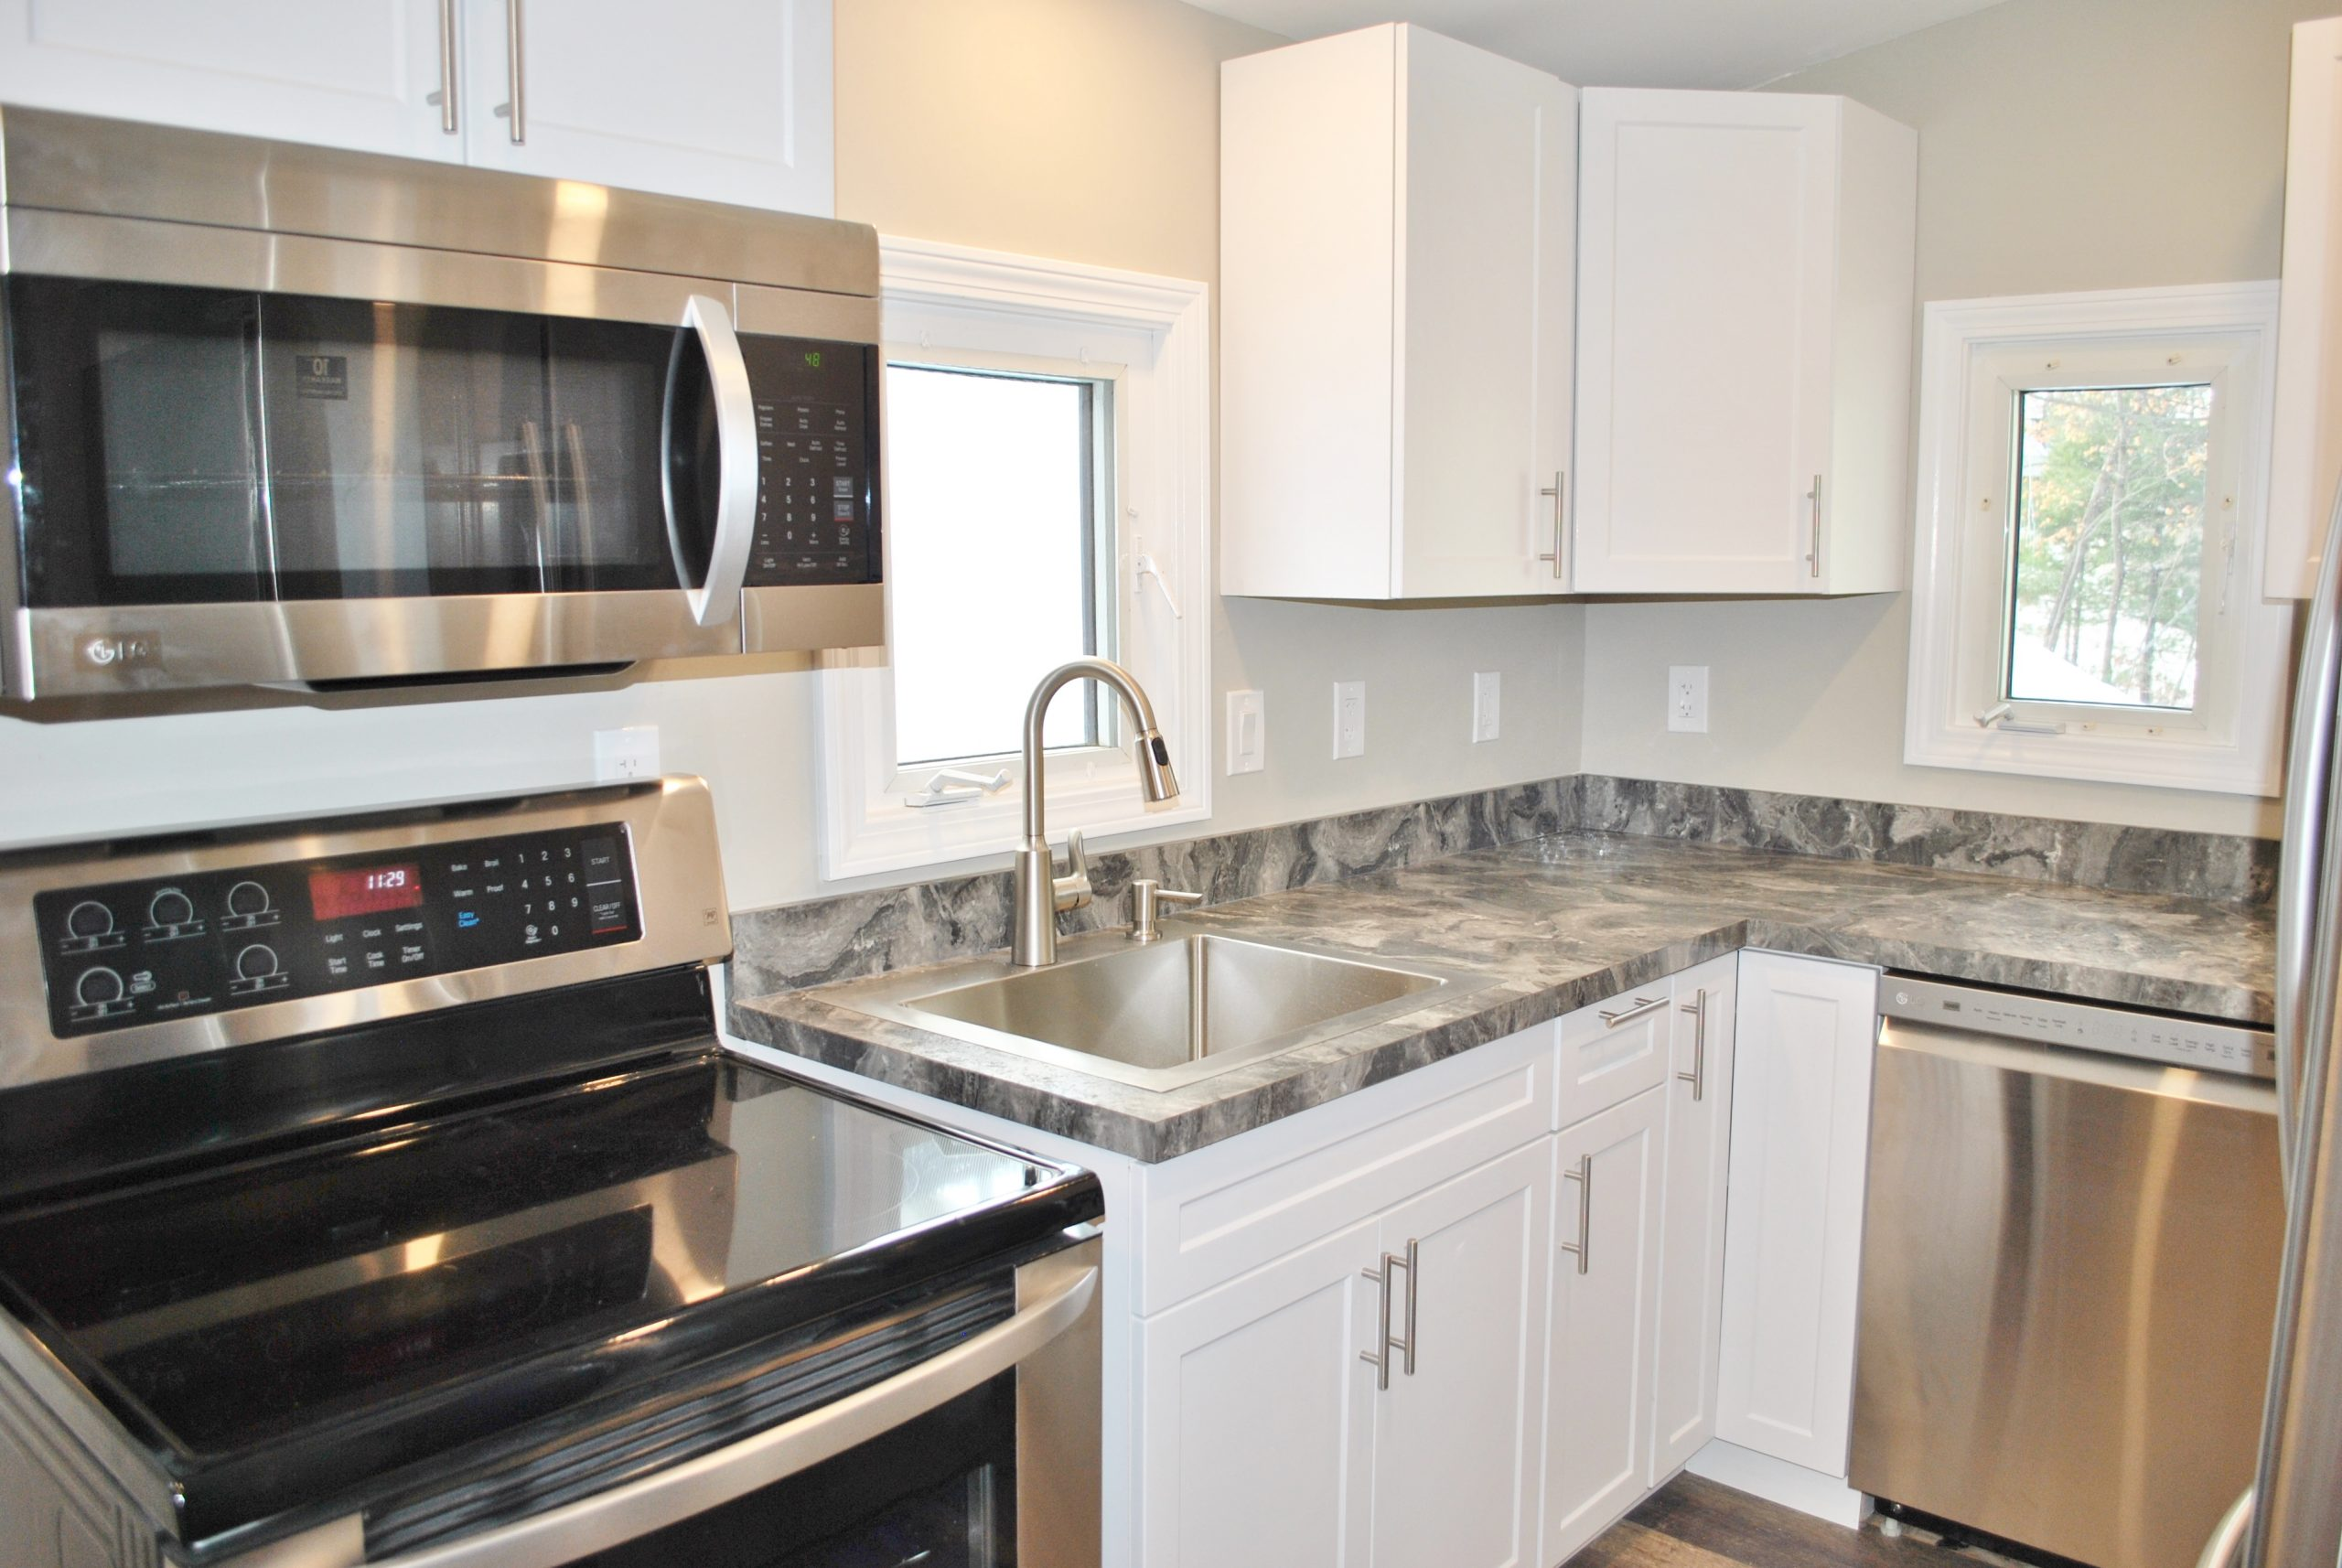 Home for Sale! 21 1/2 Fairmount St., Nashua, NH 03064